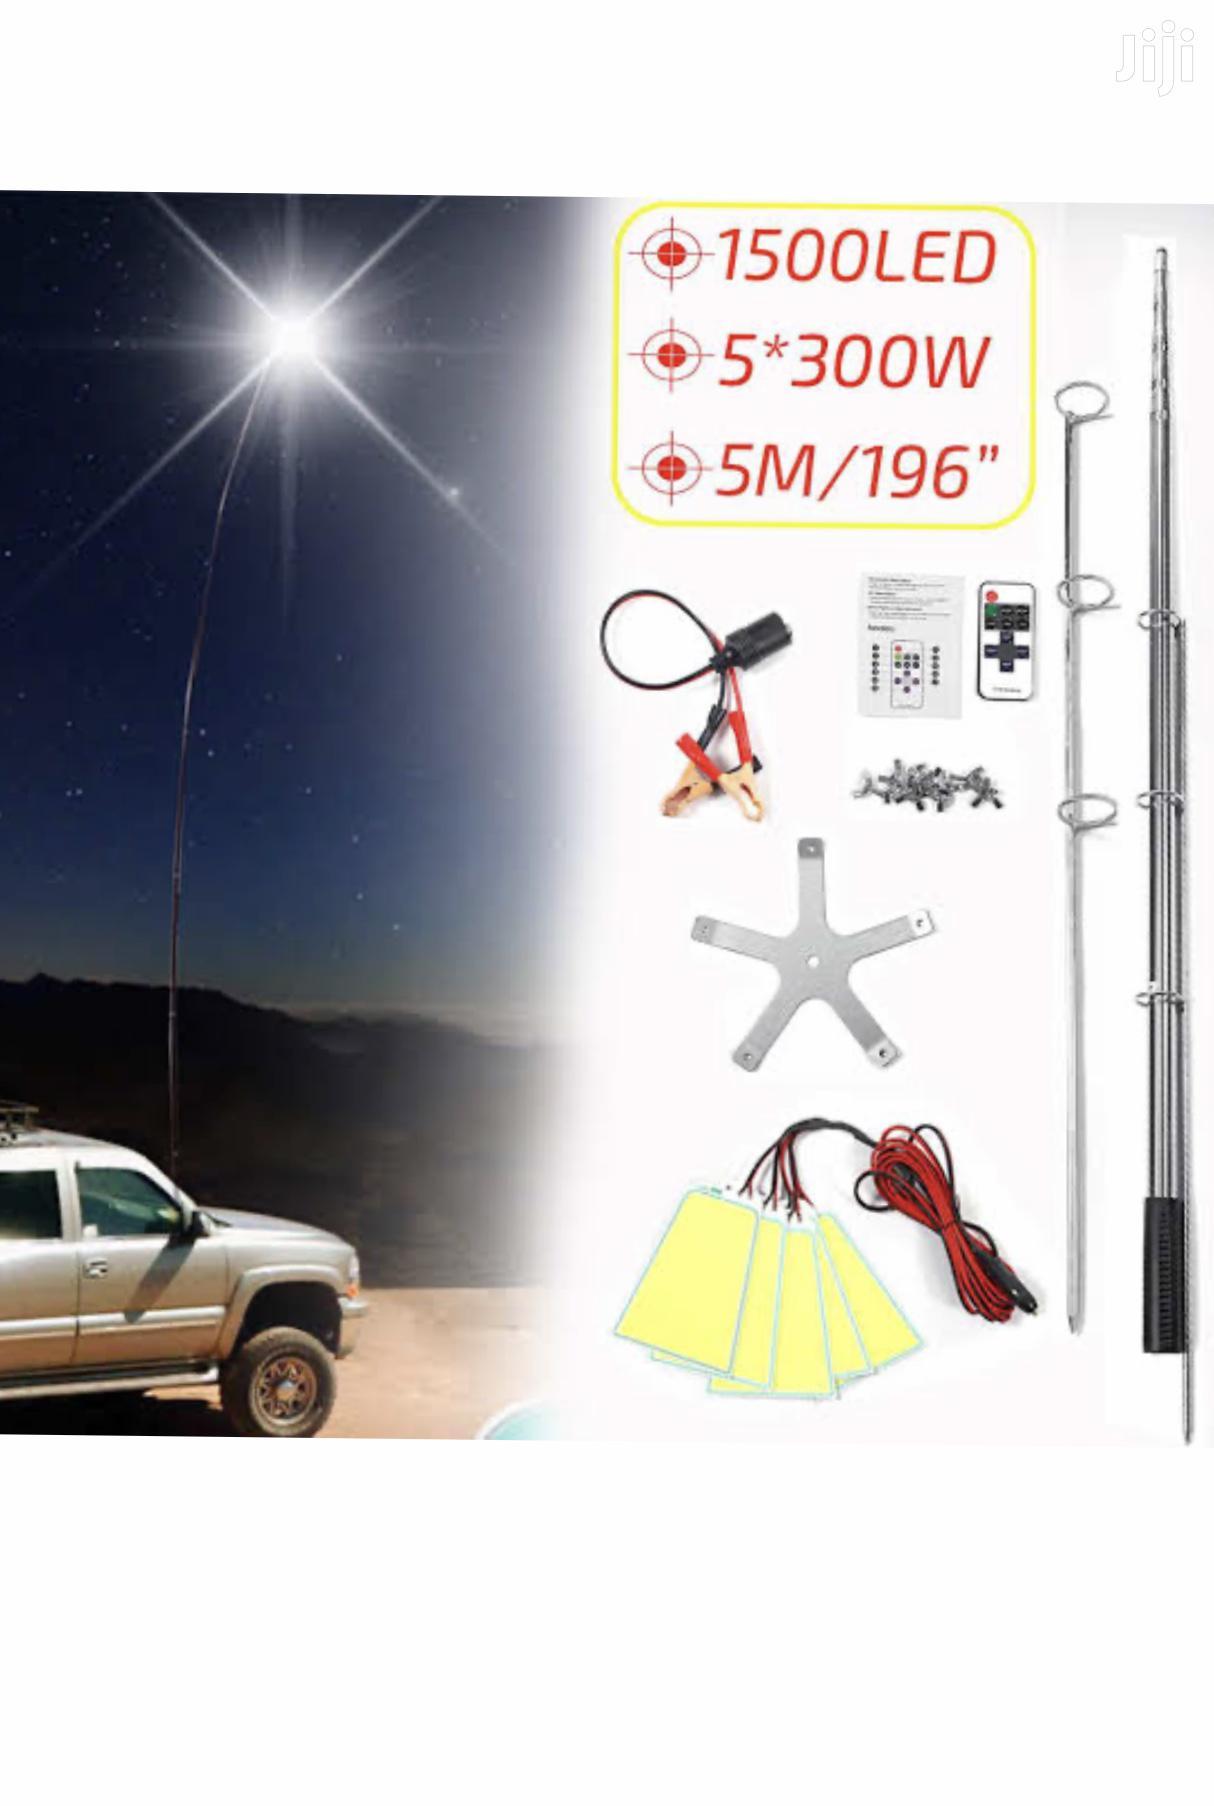 Telescopic Rod 4m Led Lights Fishing Camping Rod | Camping Gear for sale in Nairobi Central, Nairobi, Kenya